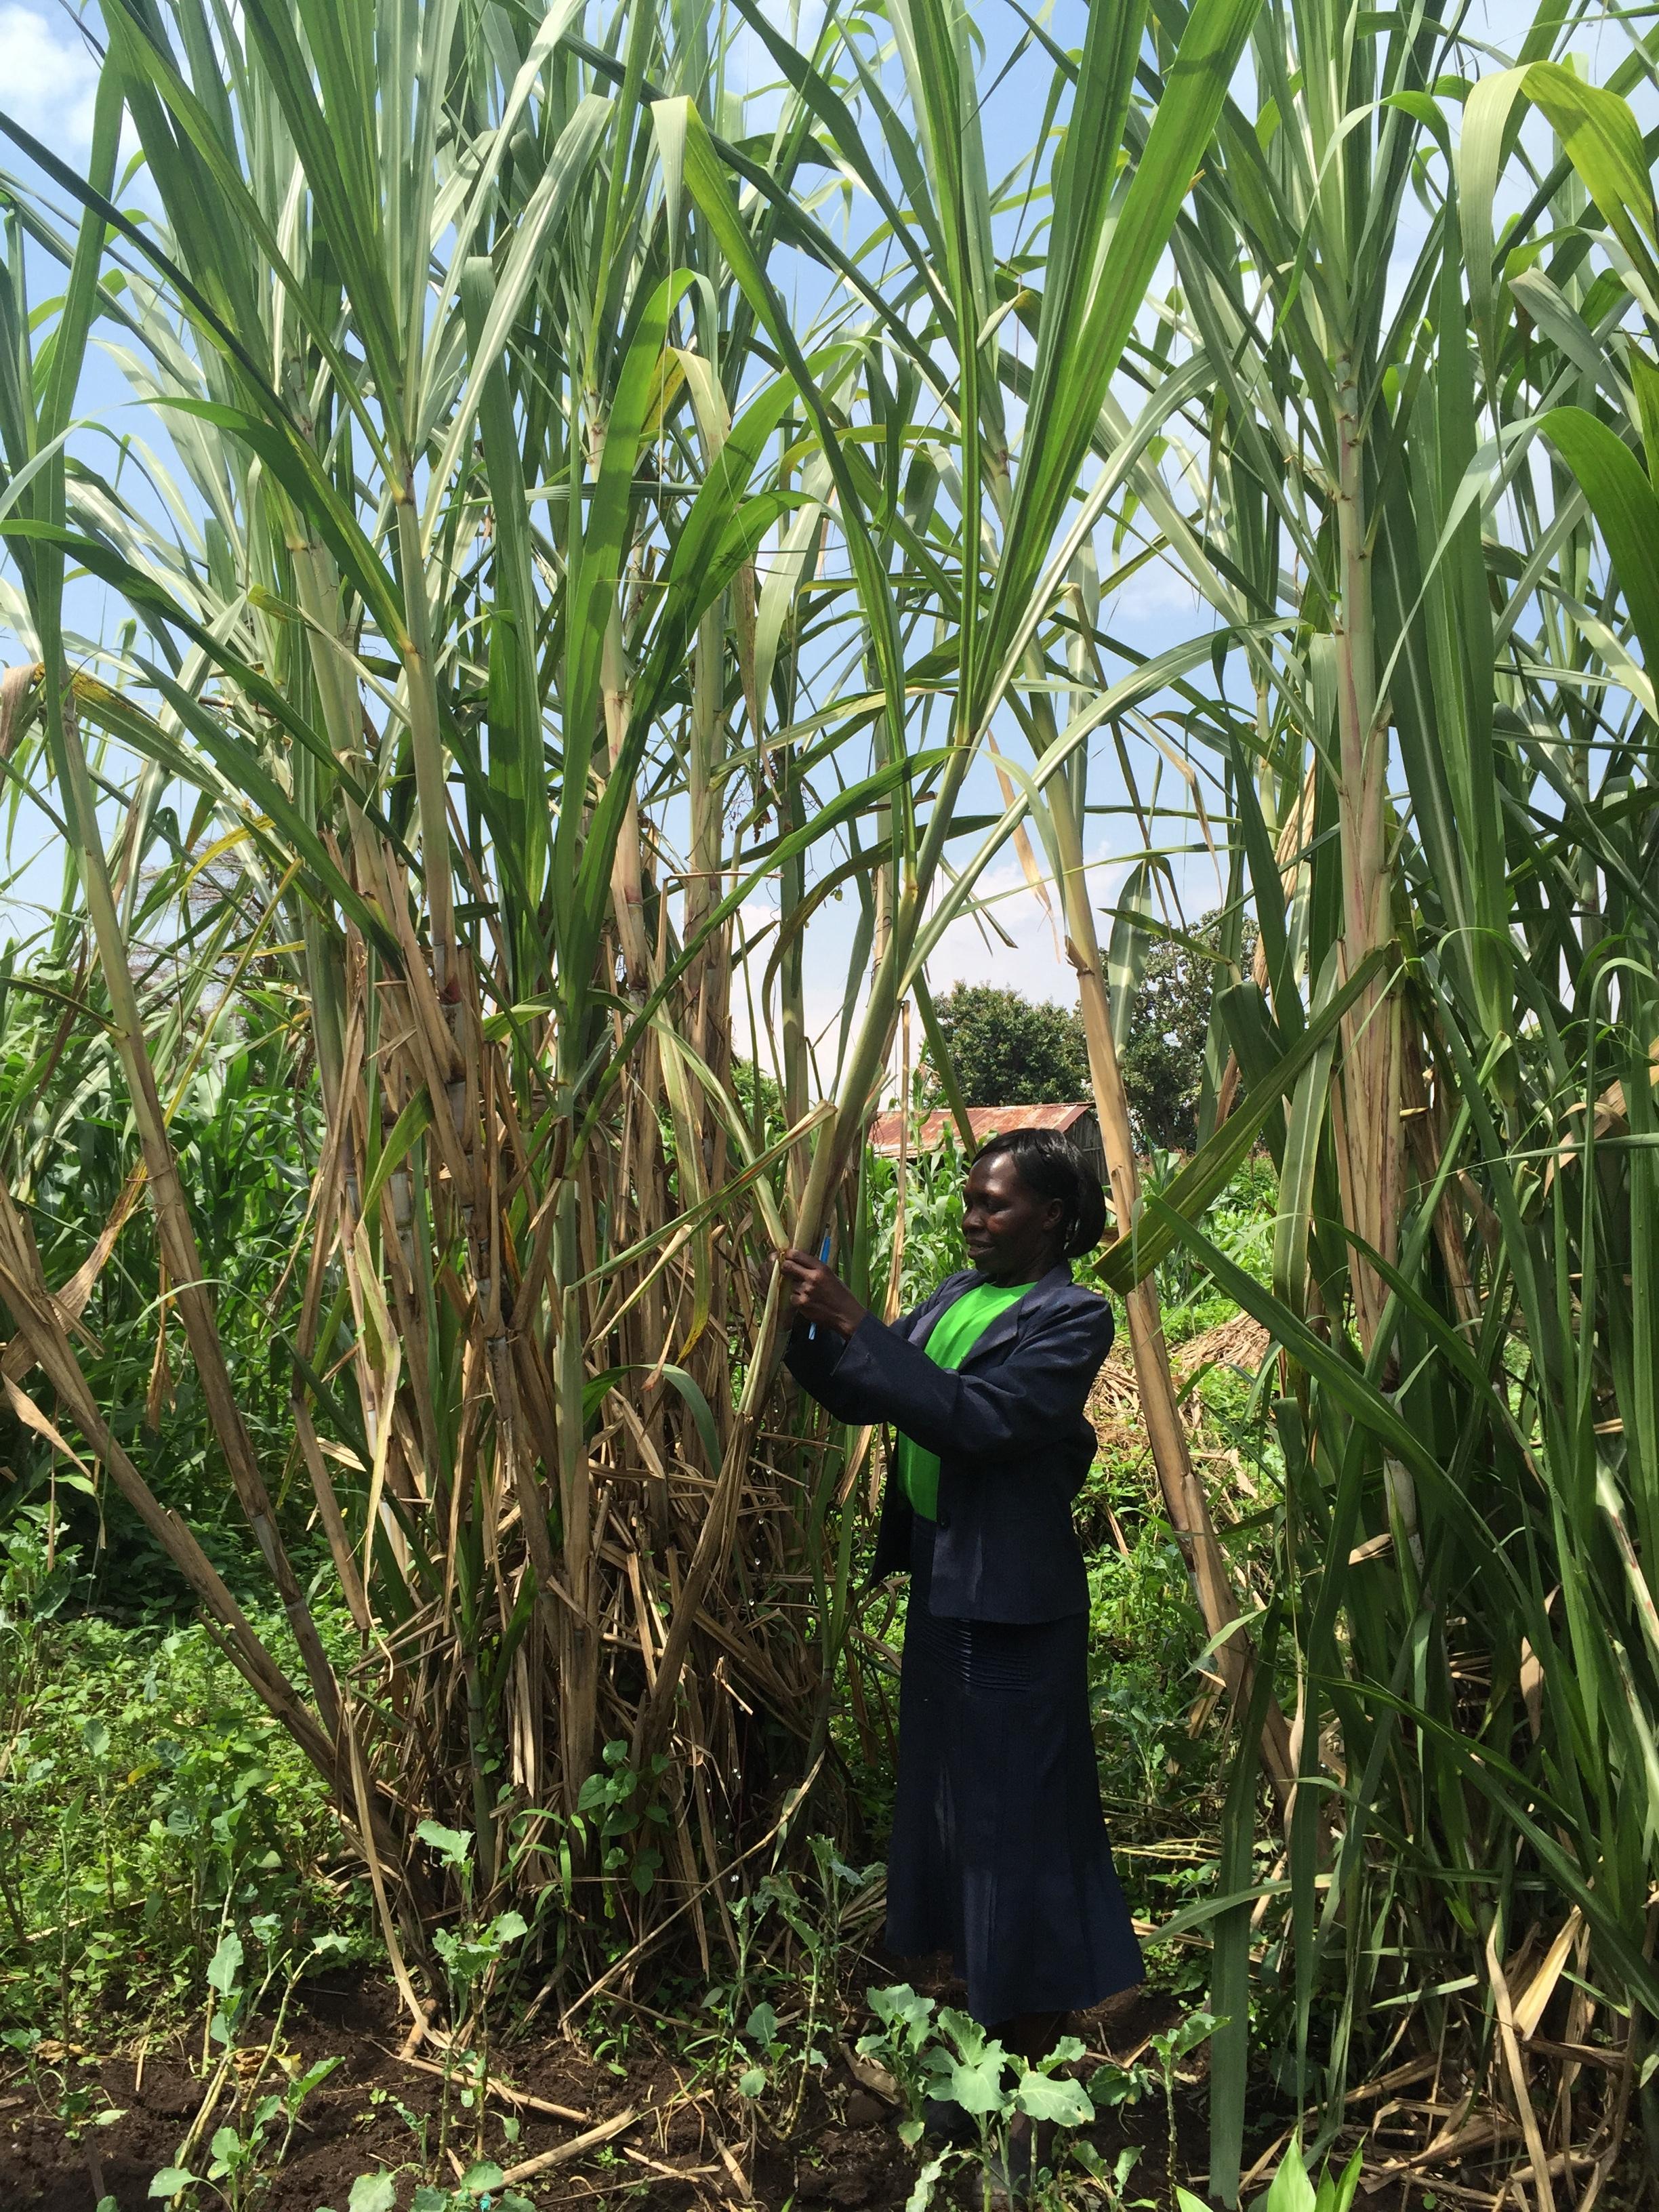 Helen taking down the stalk of sugarcane